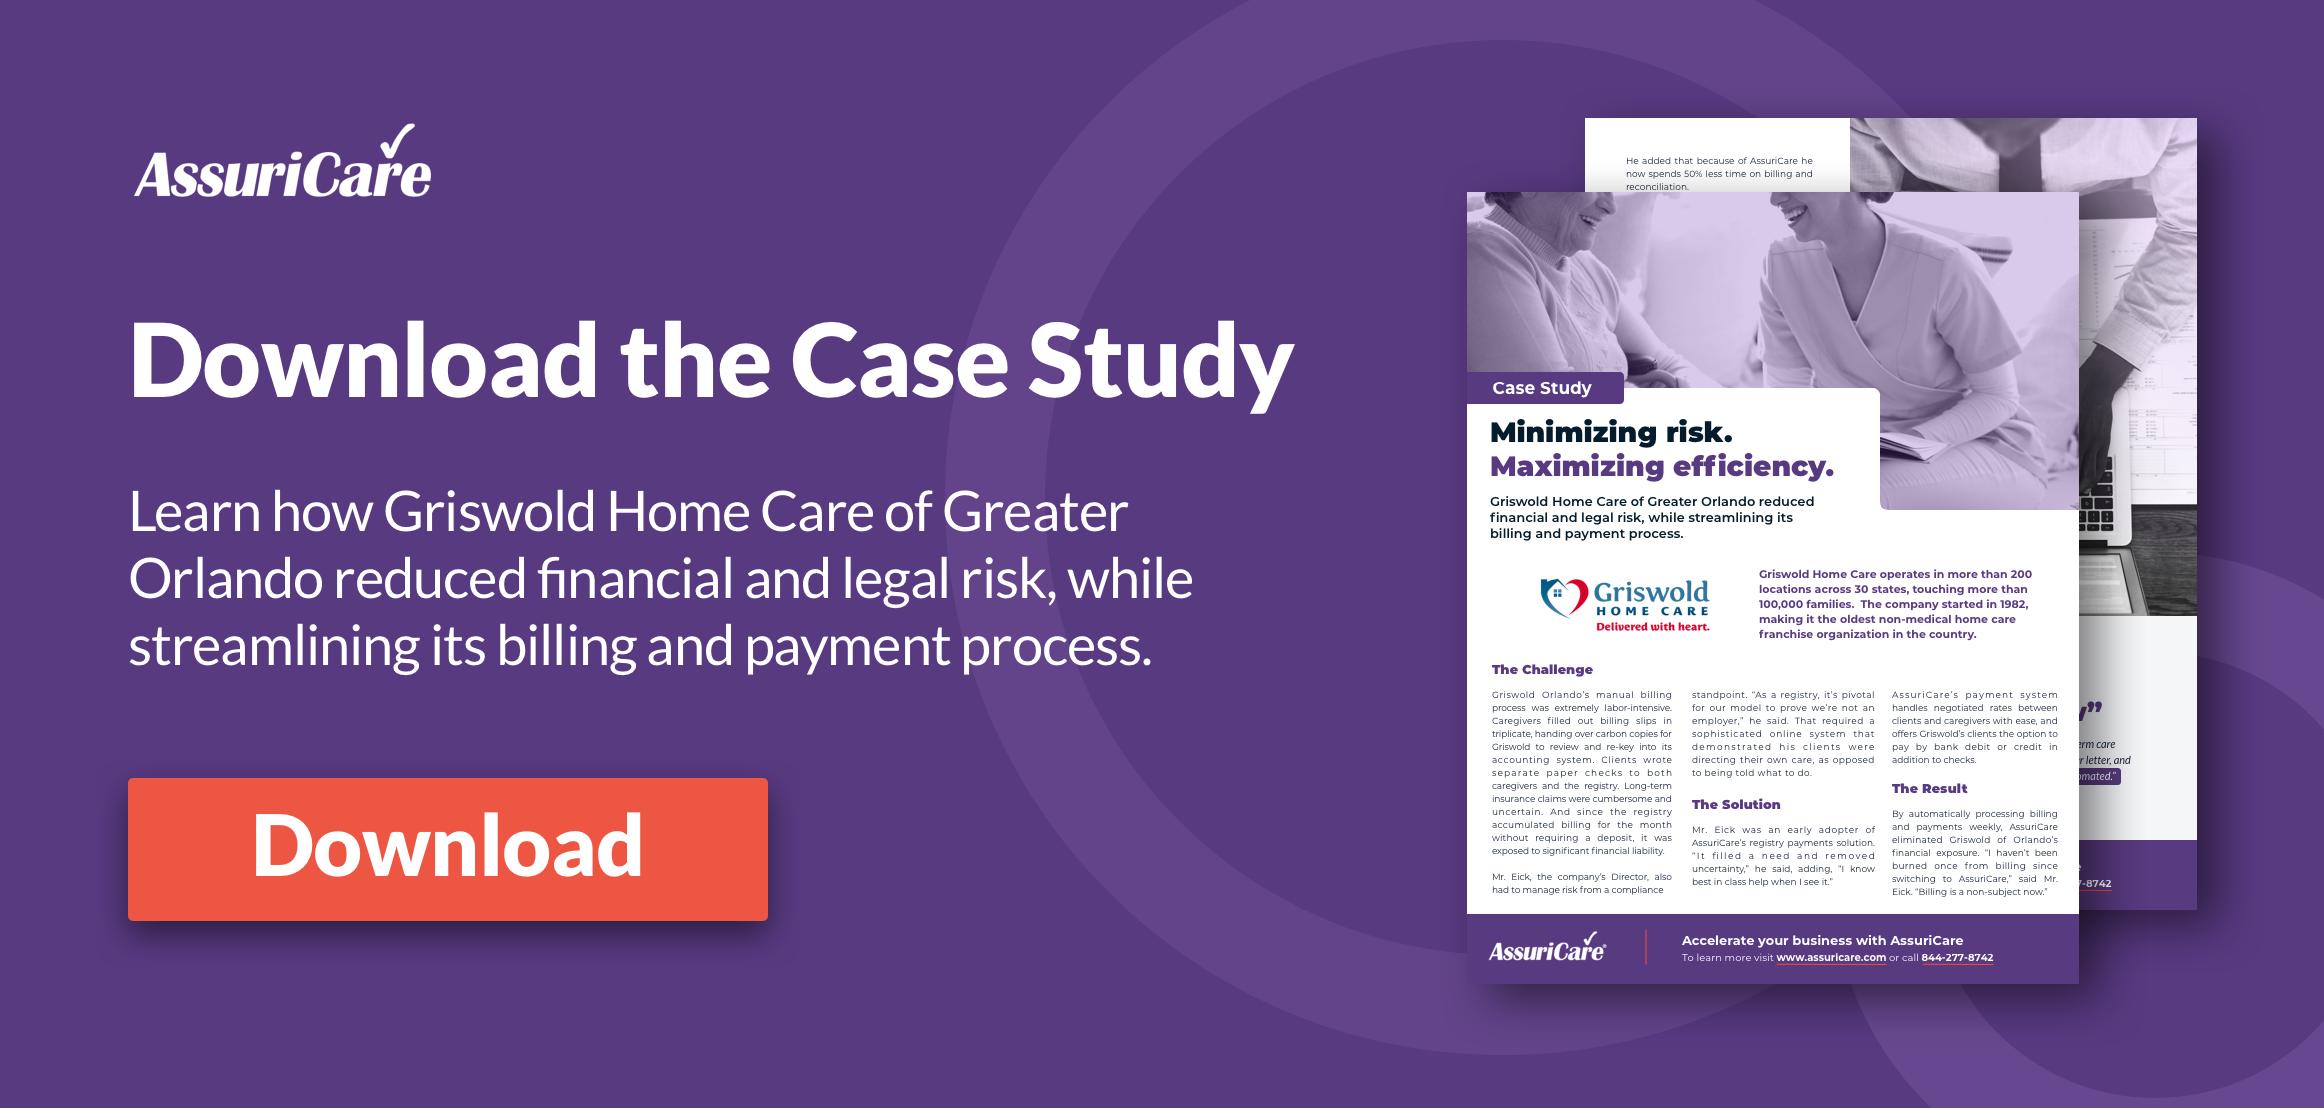 AssuriCare Case Study - Griswold Home Care of Orlando